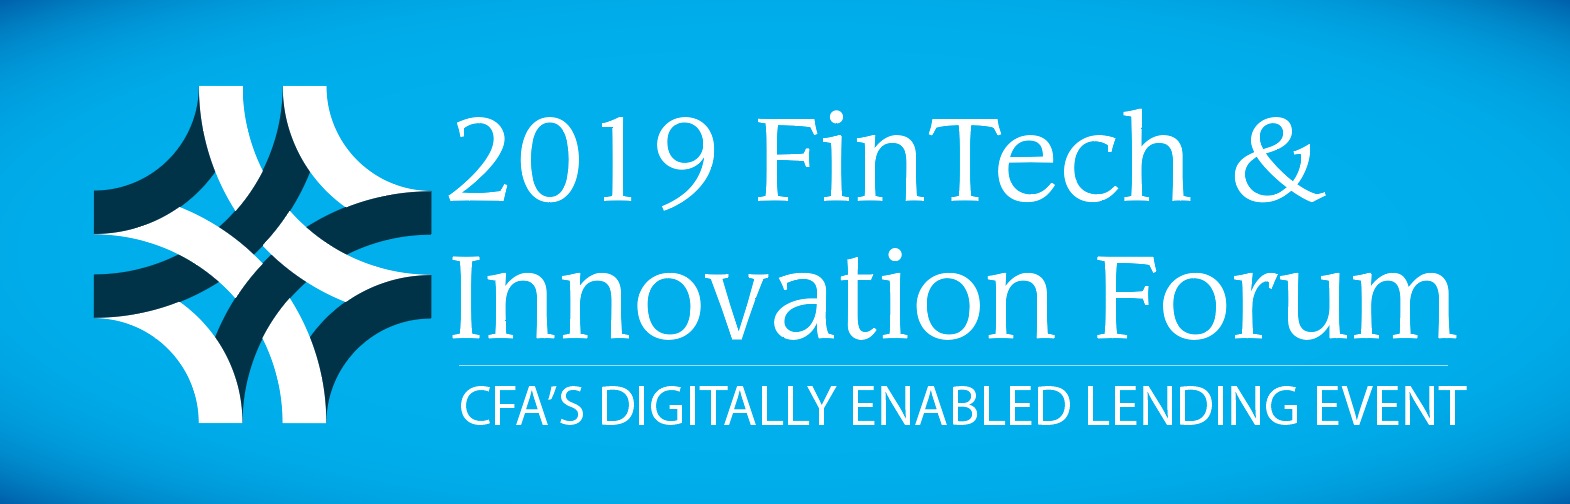 CFA 2019 Fintech & Innovation Forum